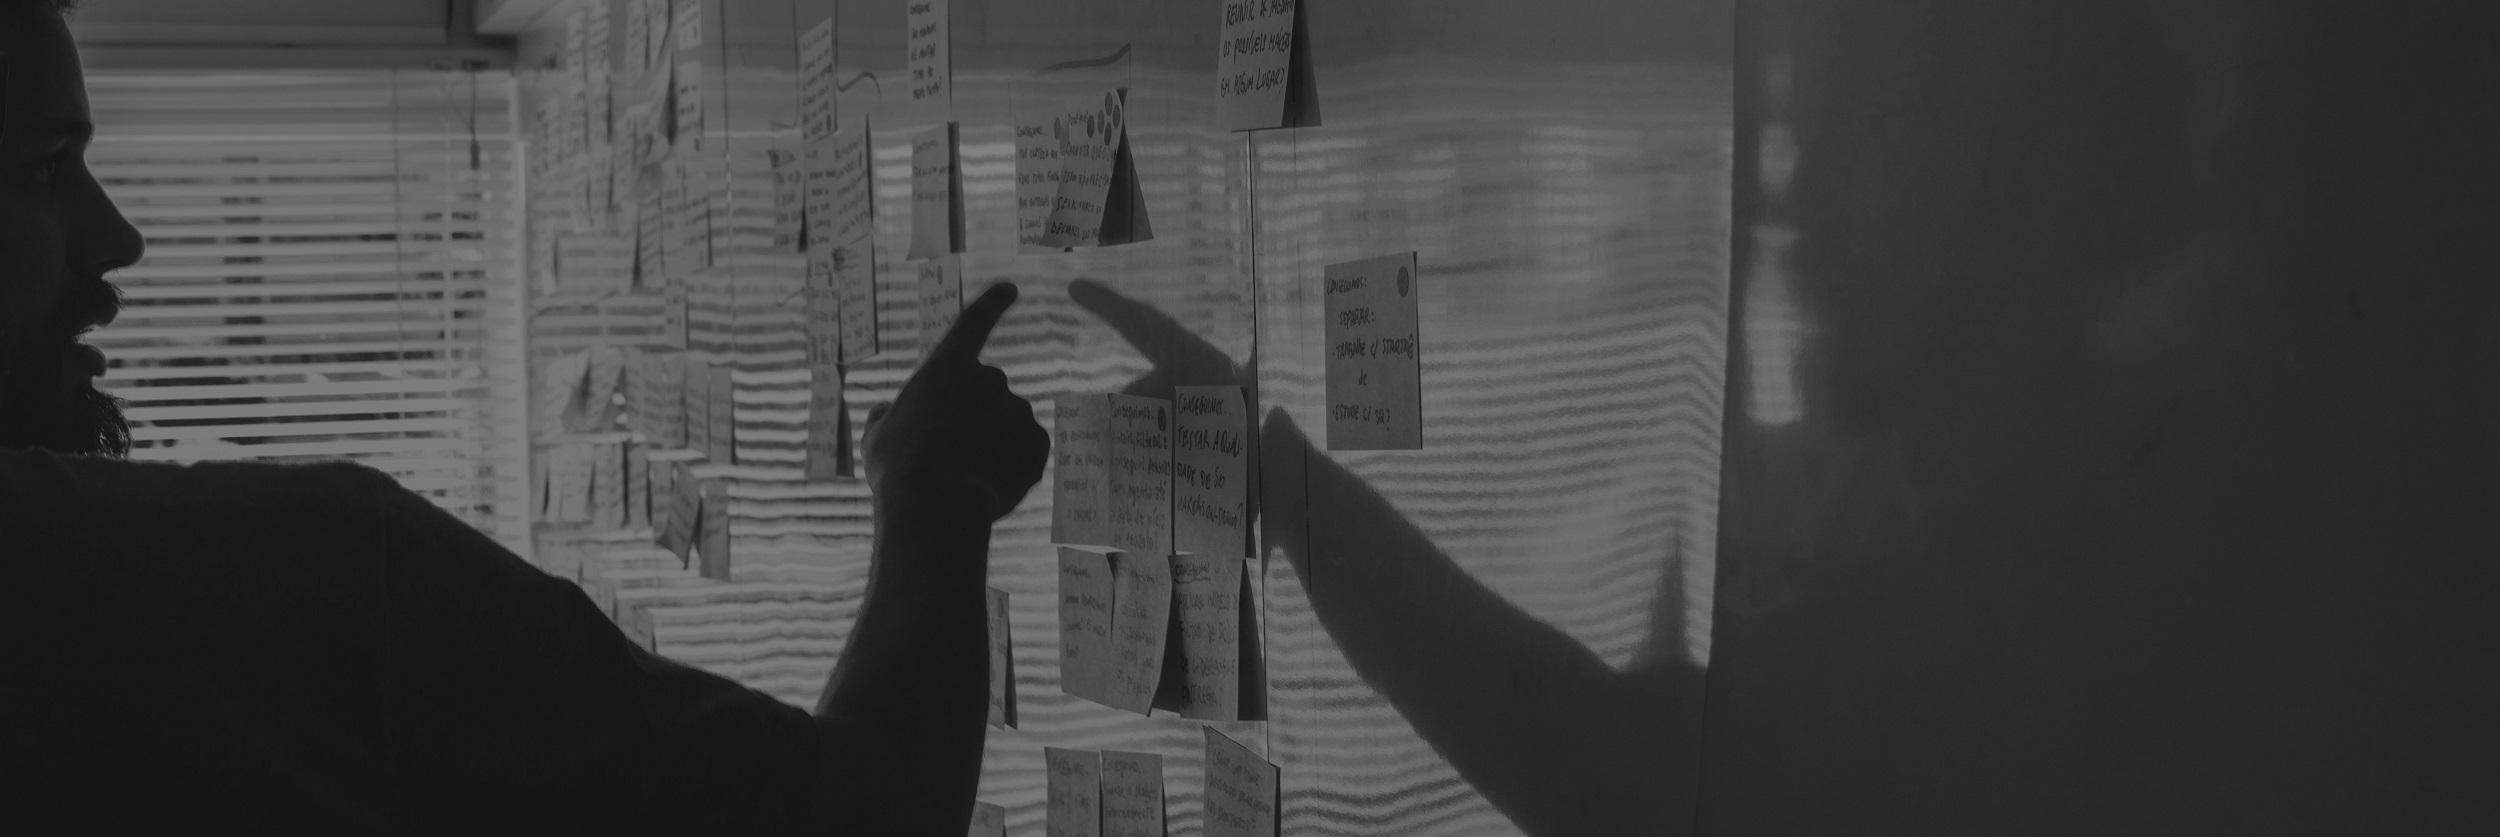 muž ukazuje na tabuľu s papierikmi